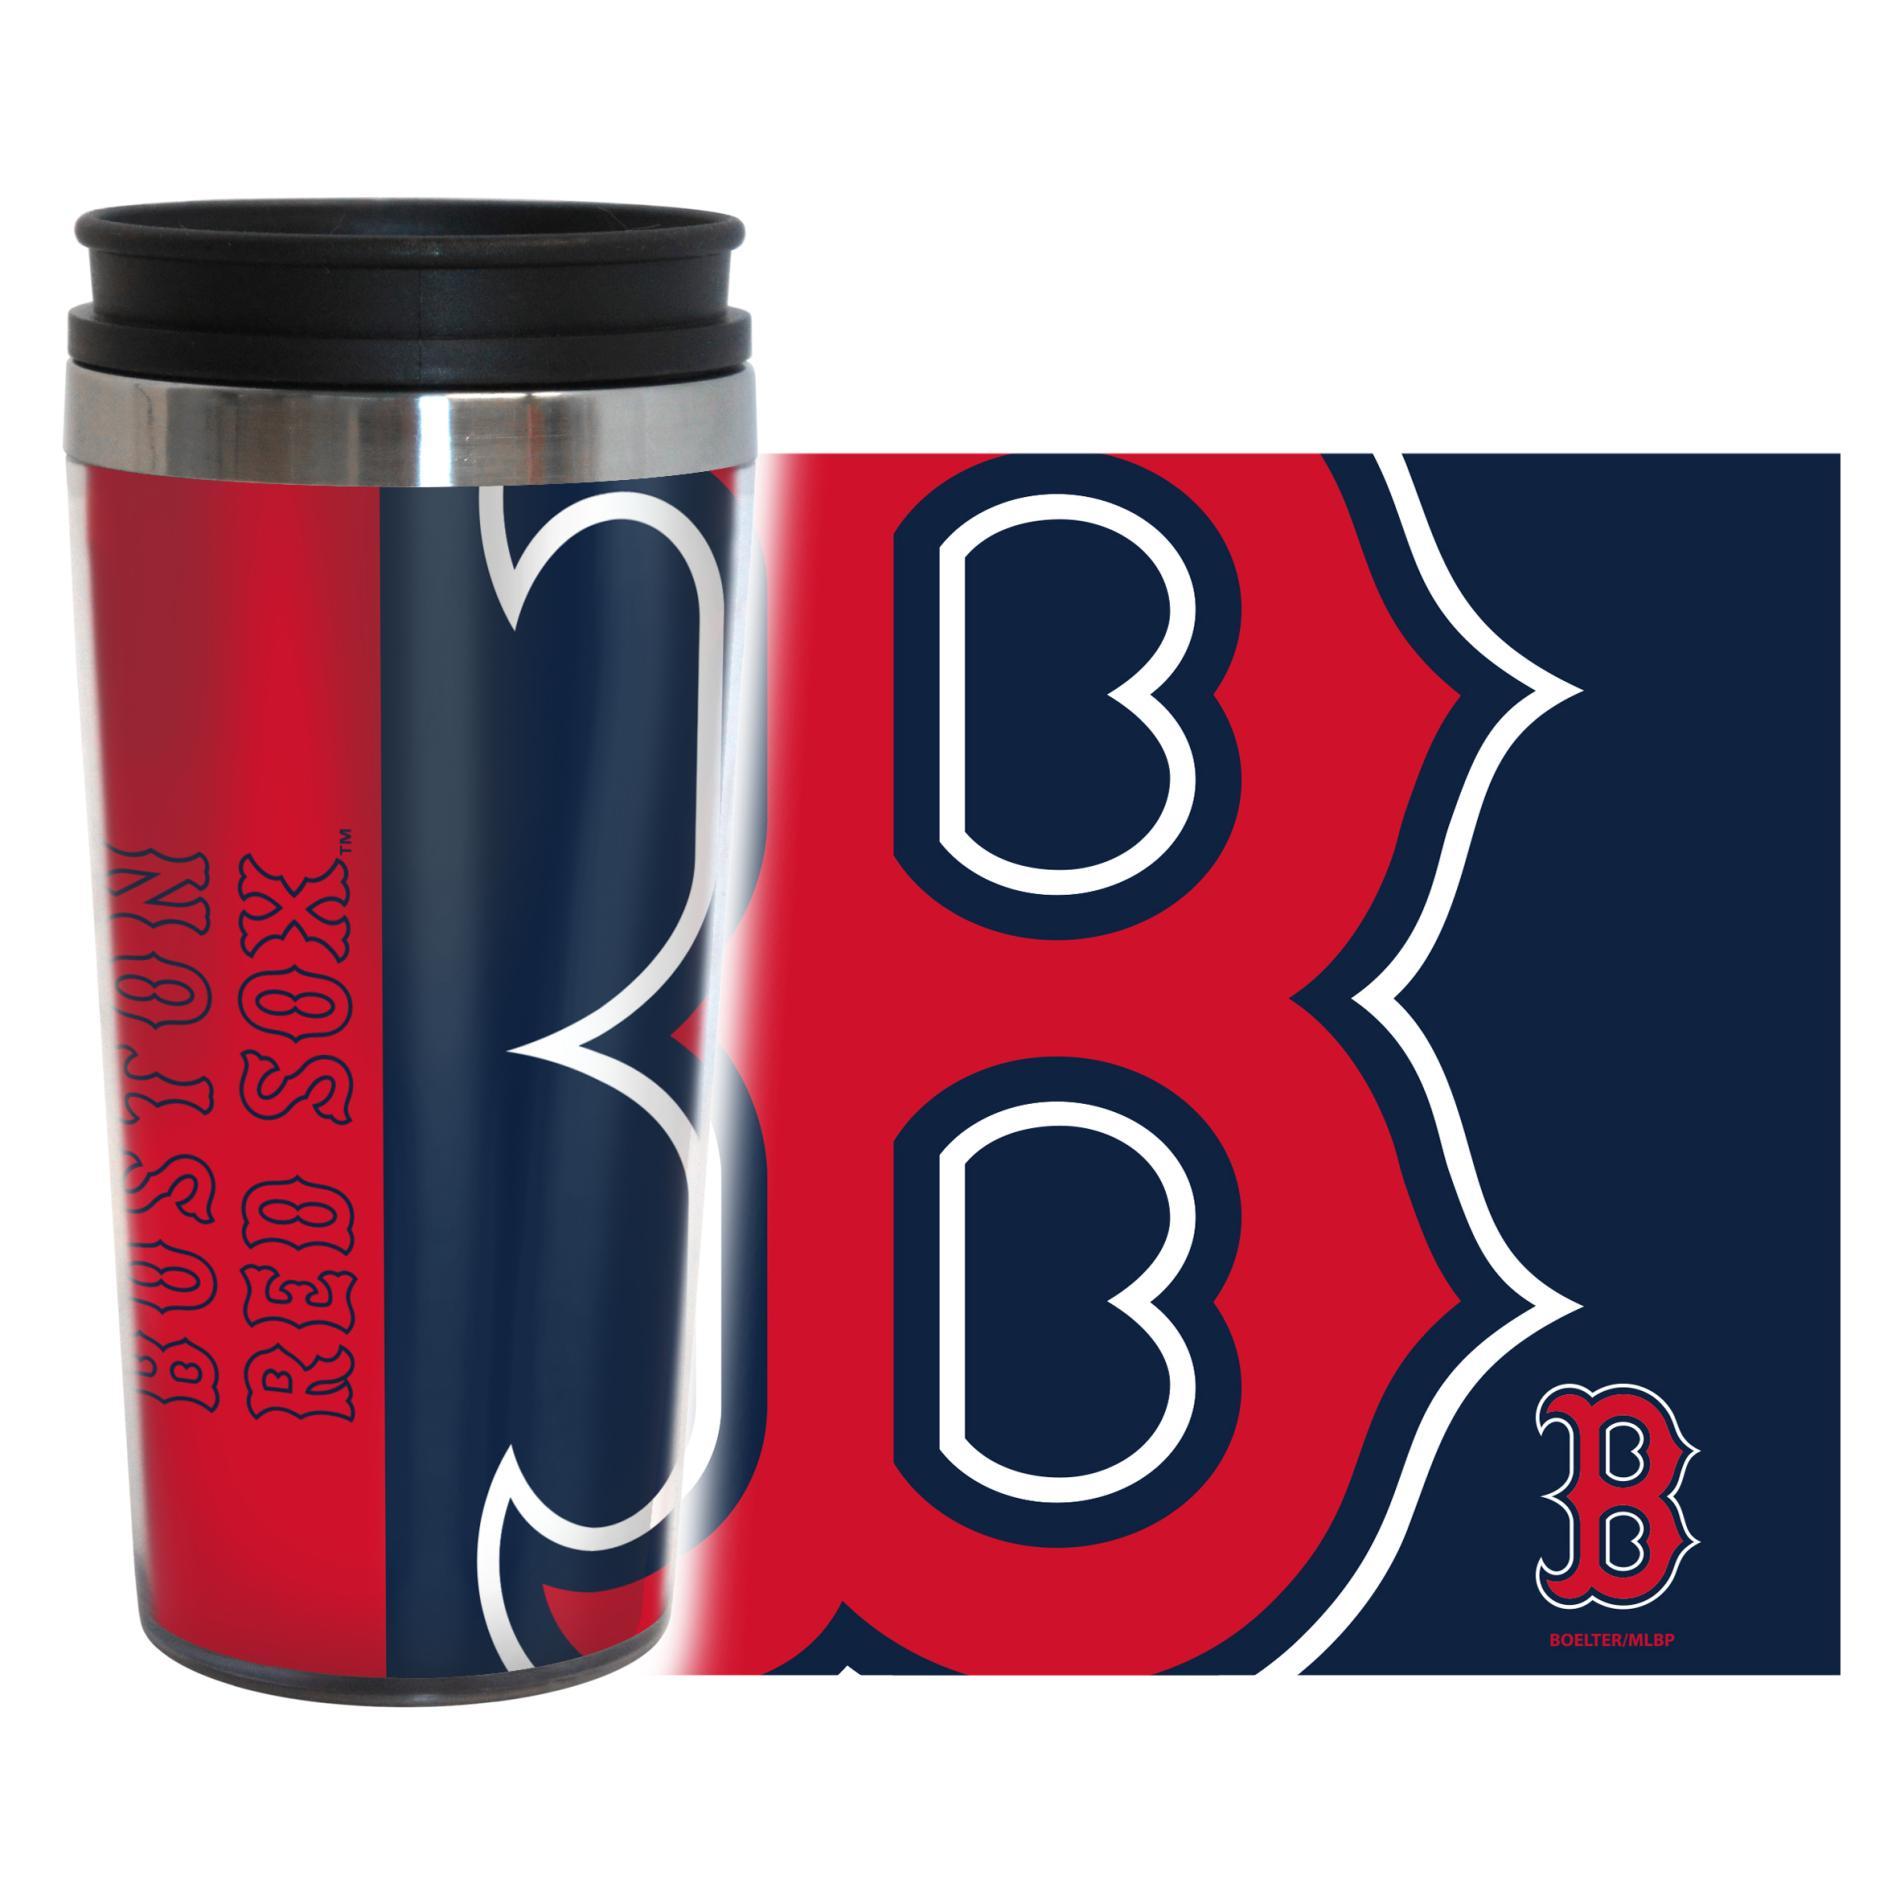 MLB Hype Travel Mug - Boston Red Sox PartNumber: 046W002656391001P KsnValue: 2656391 MfgPartNumber: 428160